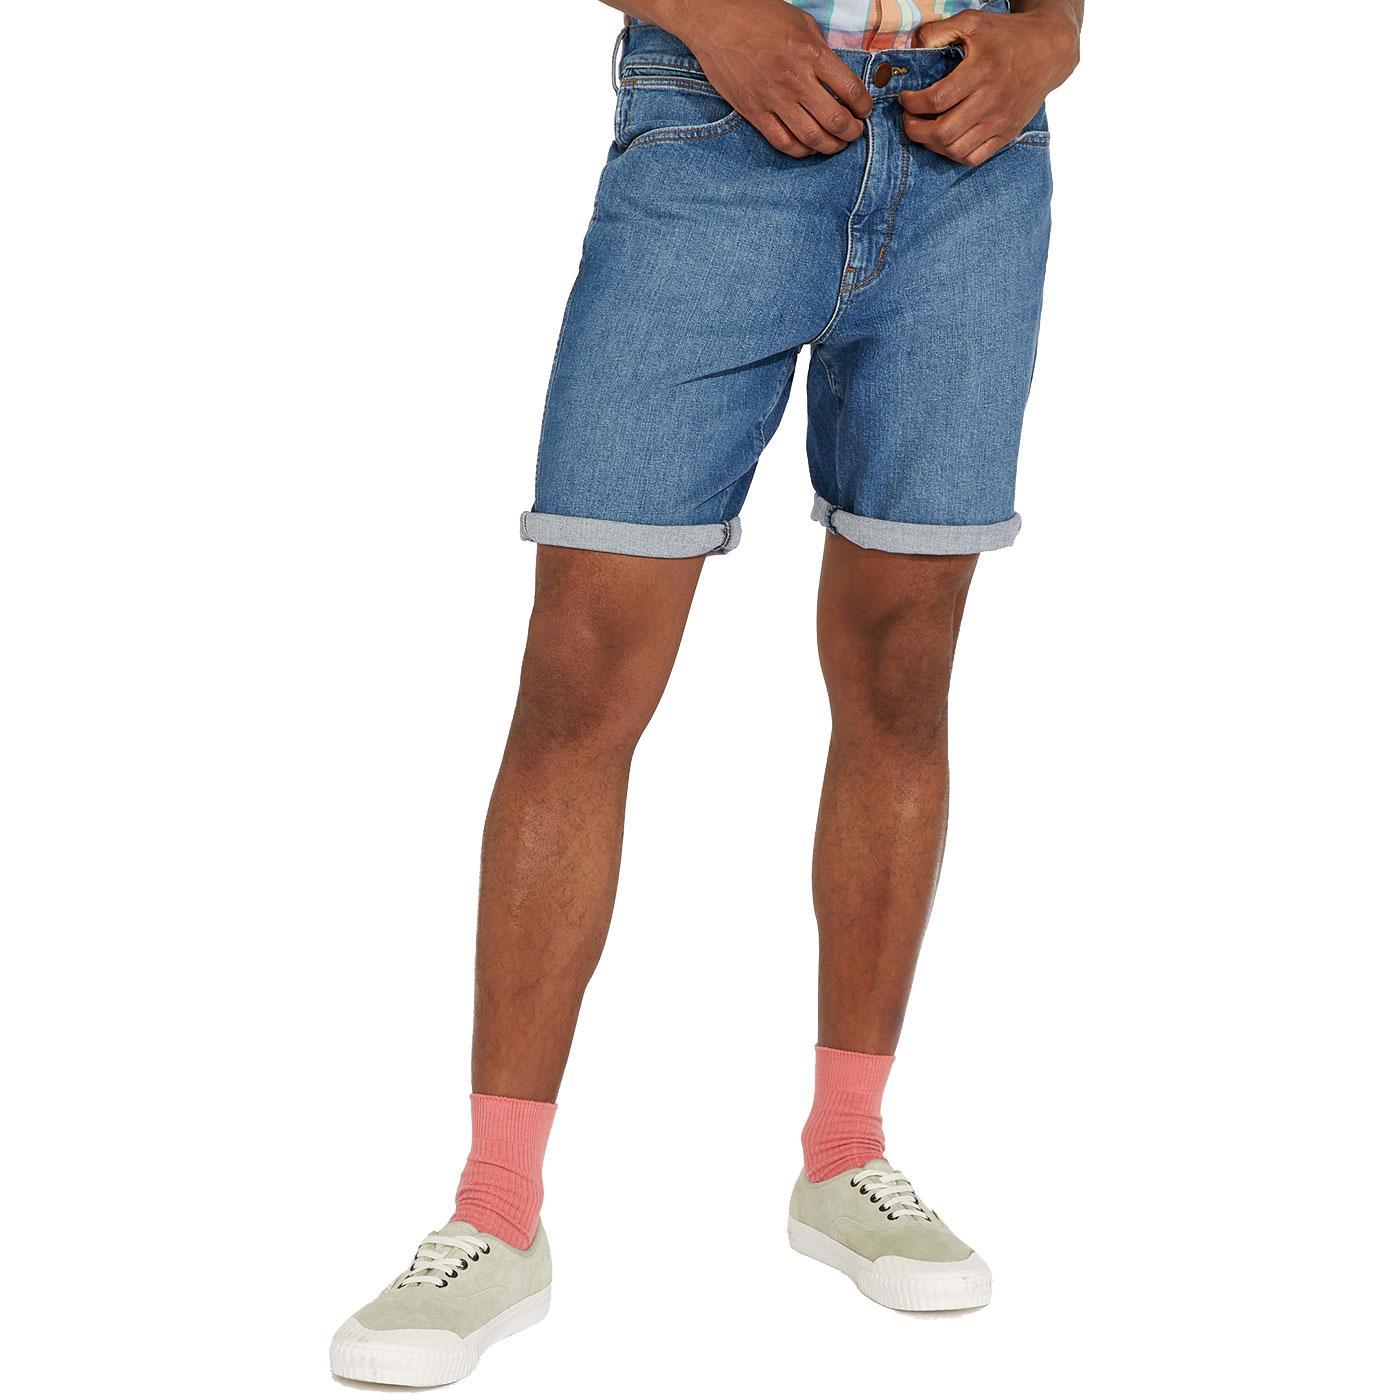 WRANGLER Men's Retro 5 Pocket Denim Shorts